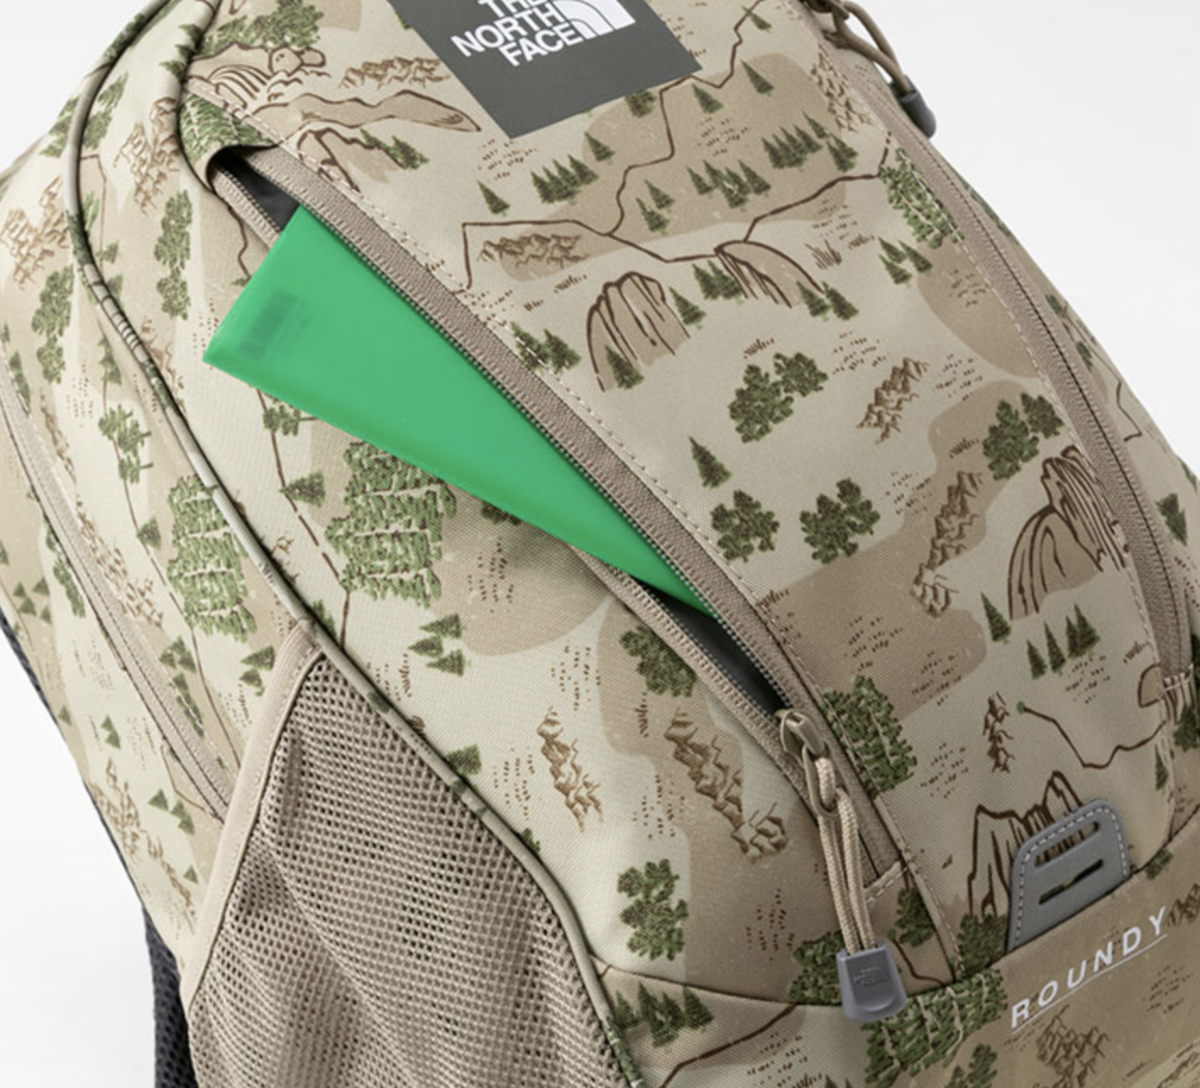 f:id:thebackpack:20191010190209p:plain